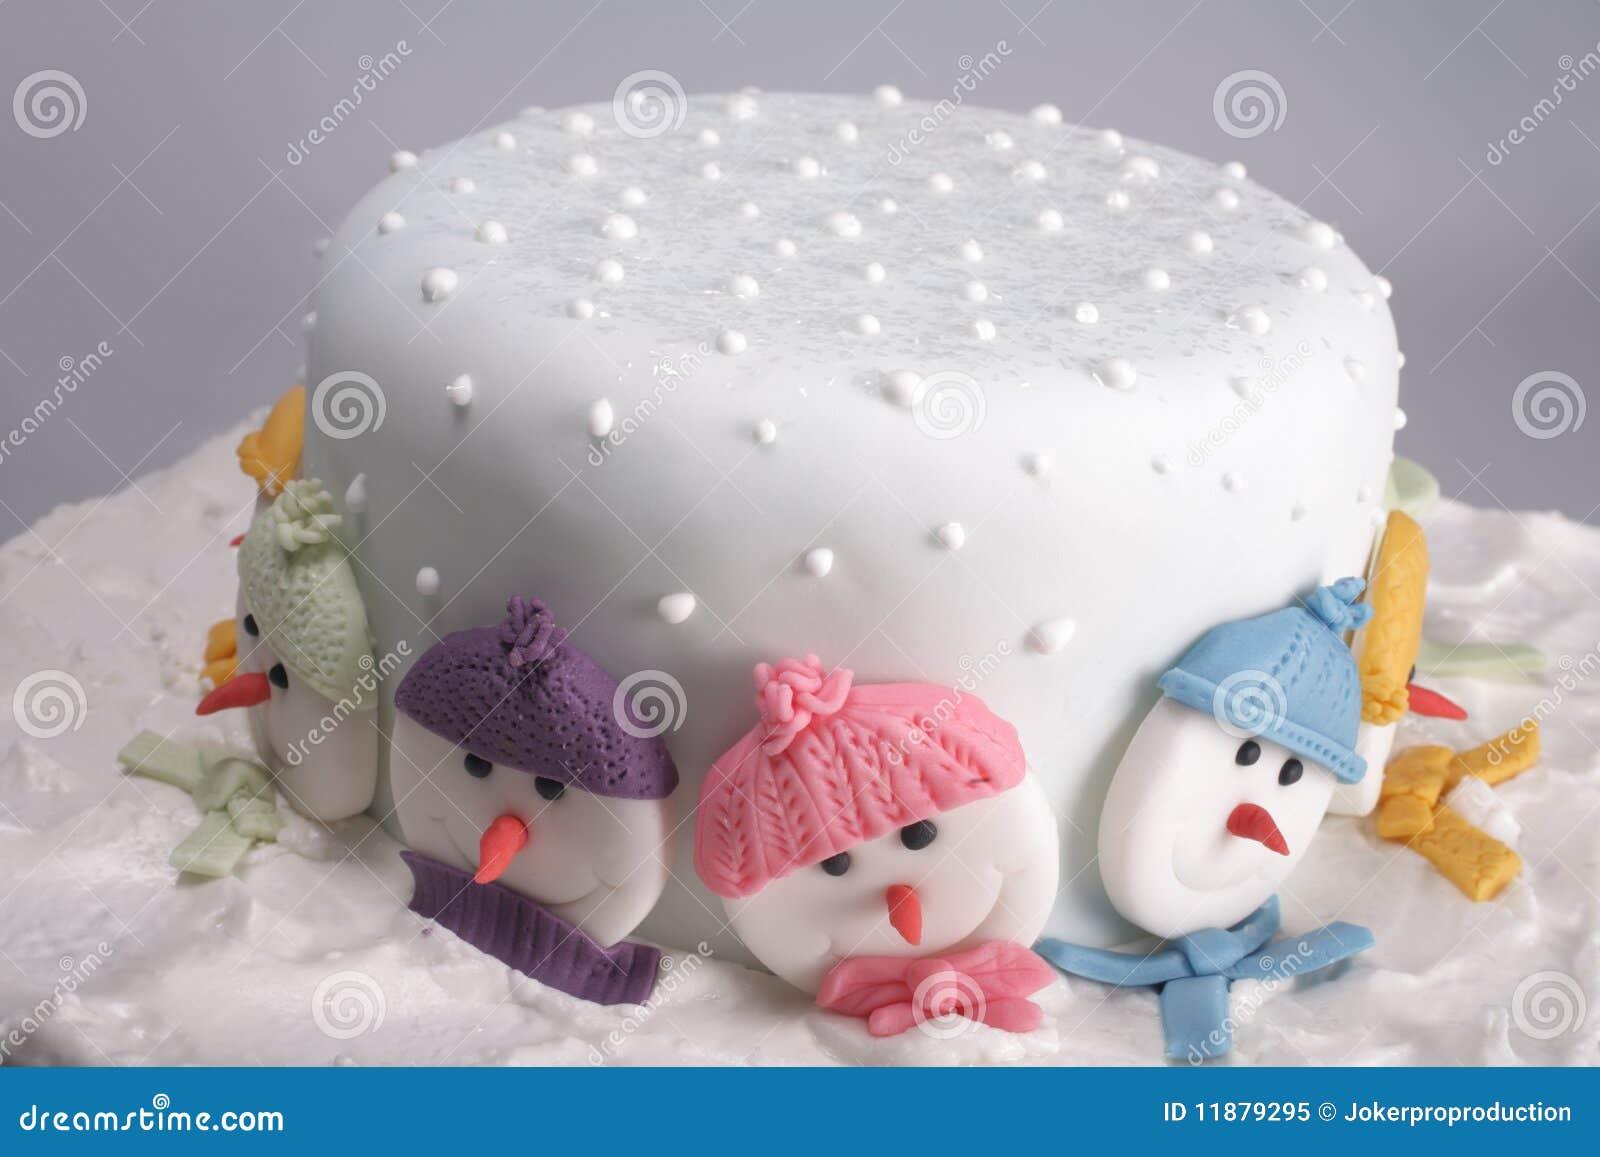 Design A Cake Christmas Opening Times : Christmas cake stock image. Image of december, seasonal ...